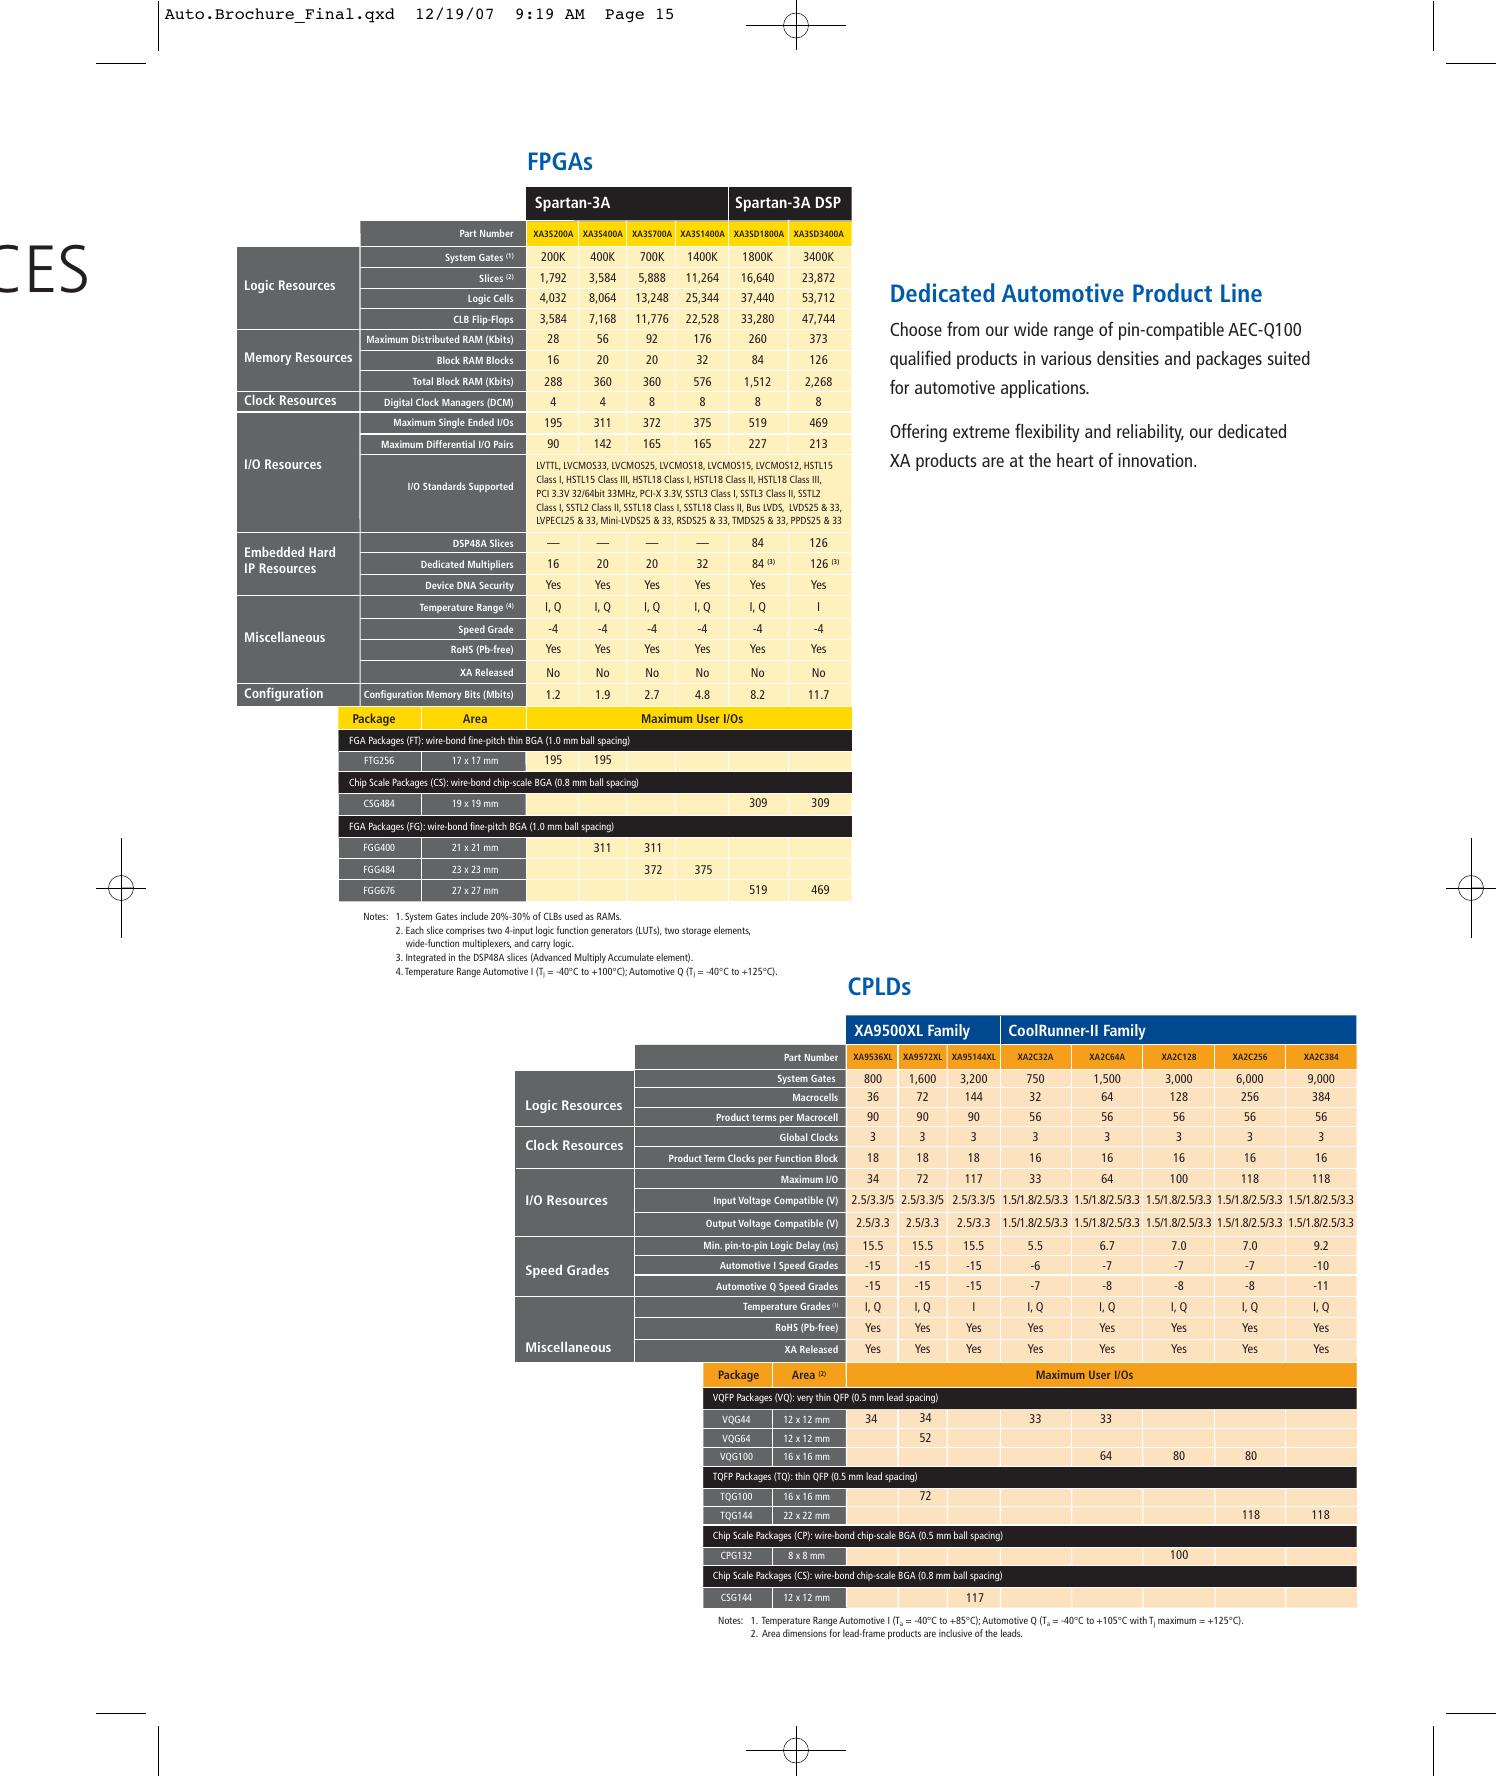 Xilinx Automotive Brochure User Manual To The 666f57c7 b26d